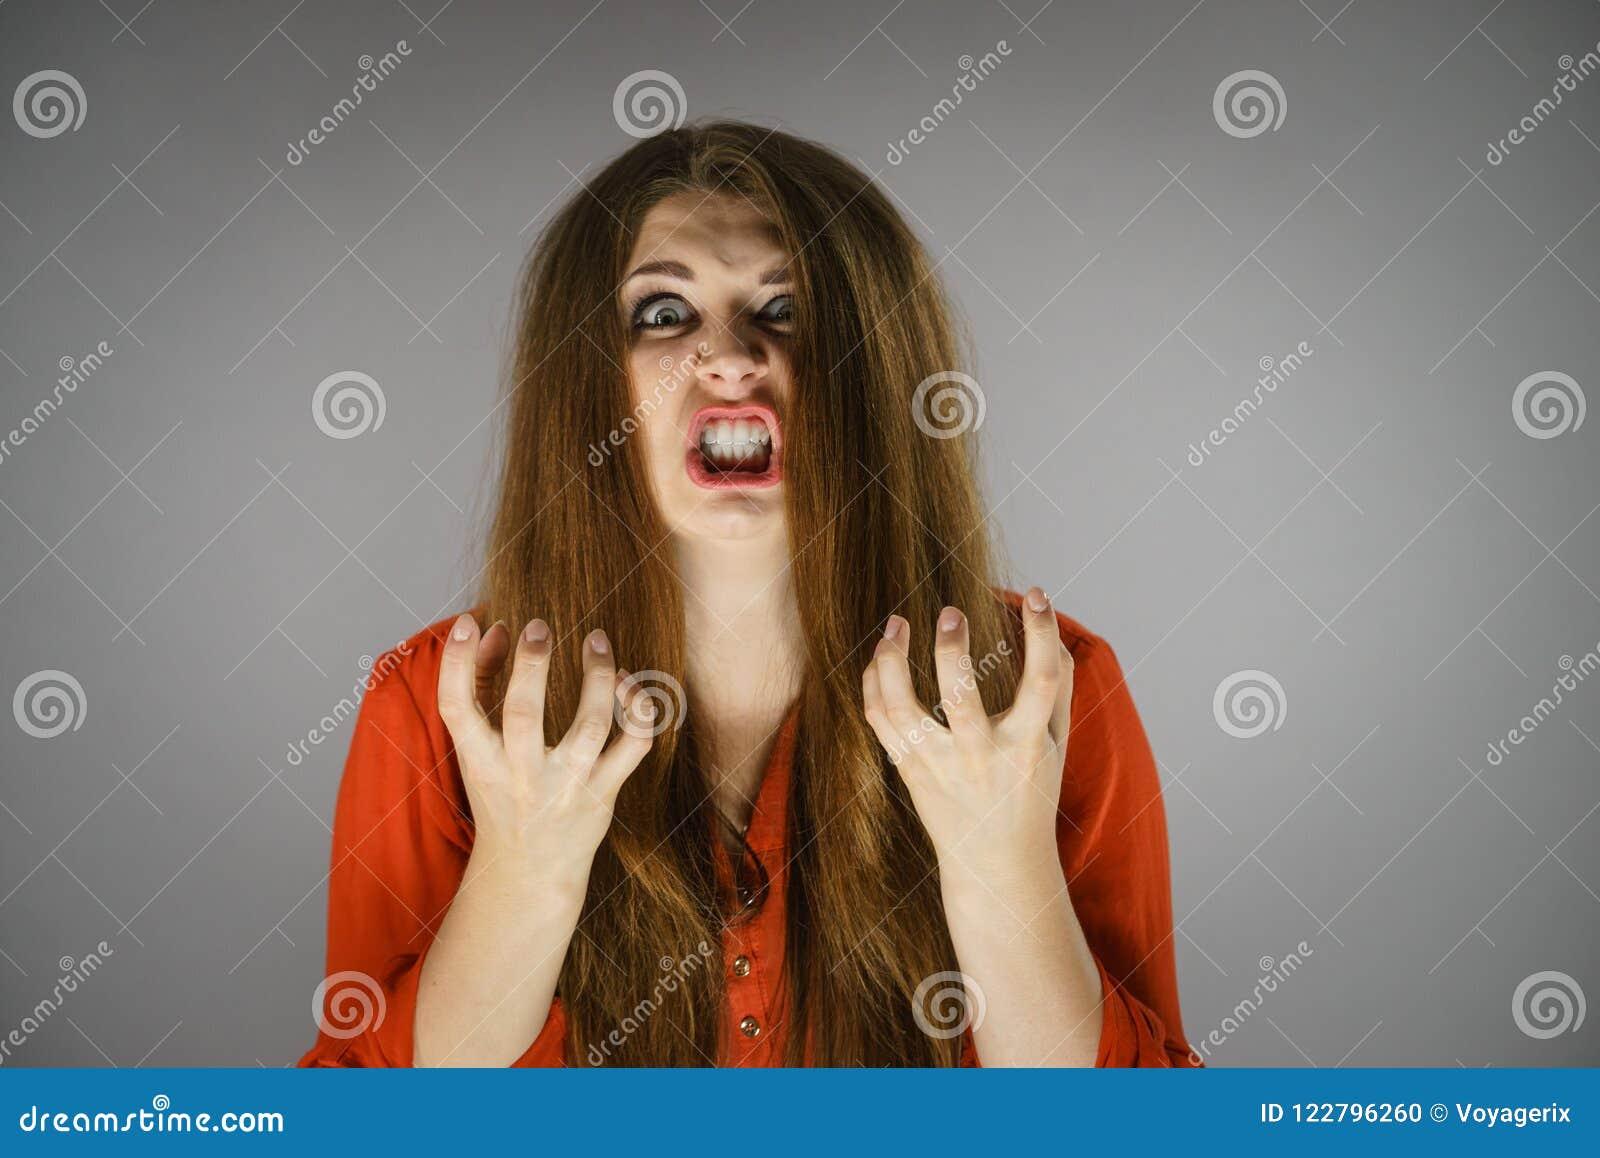 Verärgerte junge hübsche Frau